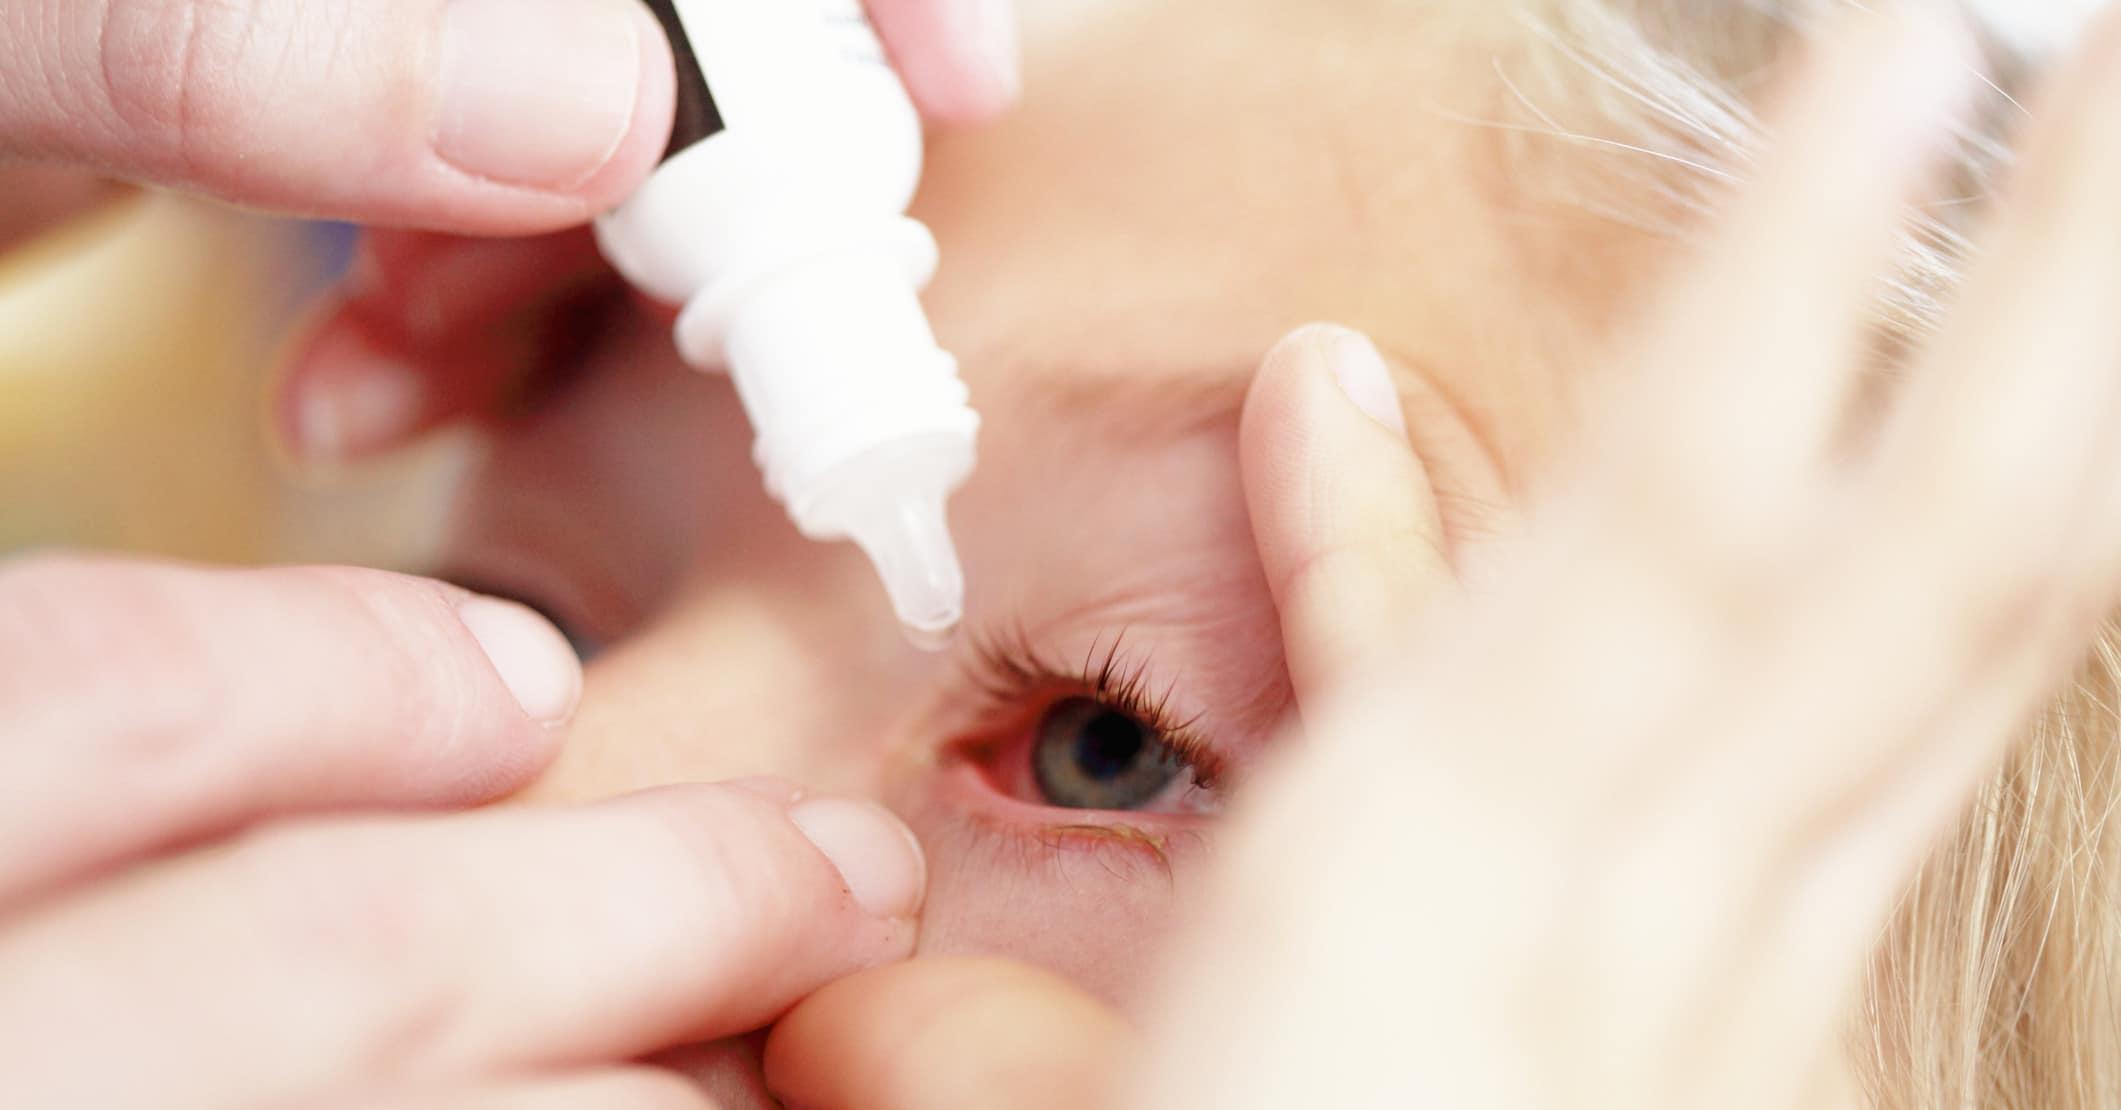 Капаем глазные капли ребенку